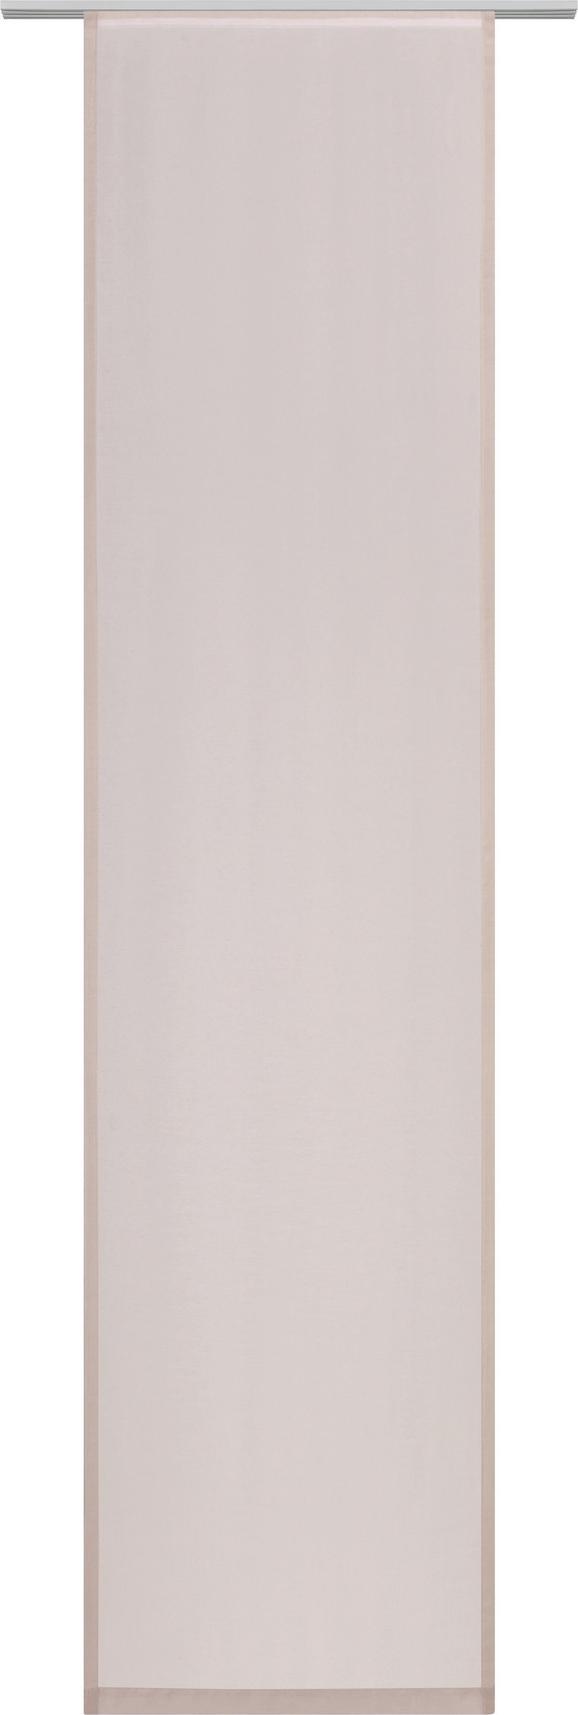 Flächenvorhang Uni Taupe 60x245cm - Taupe, MODERN, Textil (60/245cm) - Mömax modern living